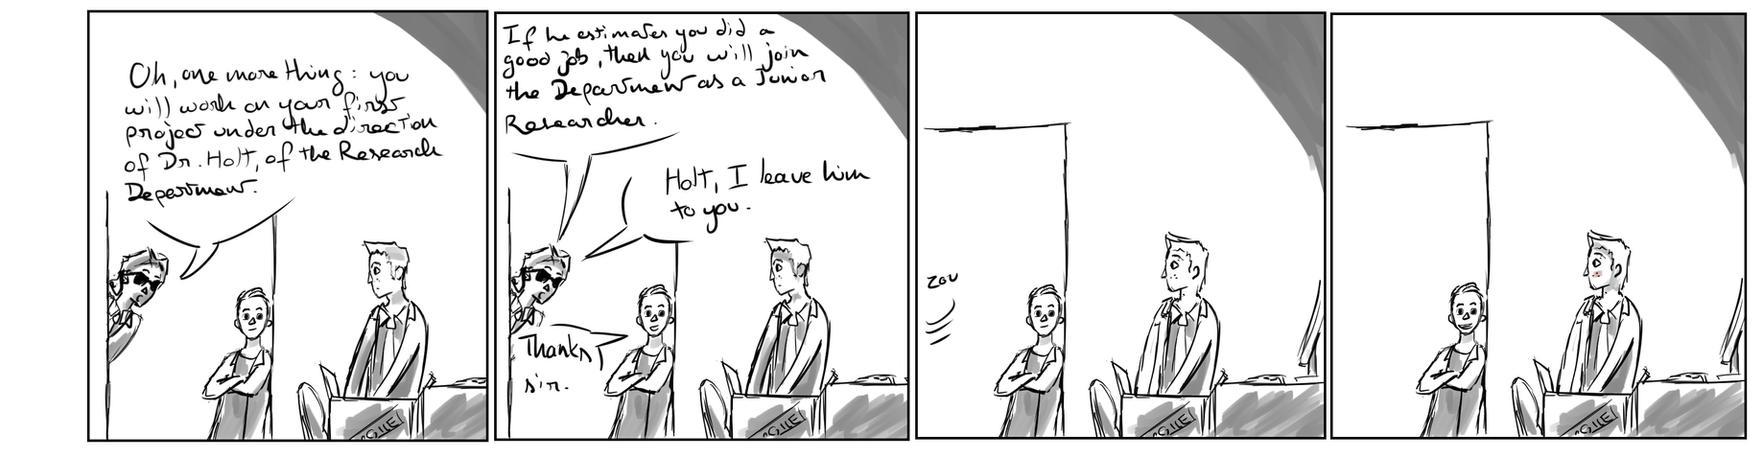 Site-Aleph Comic Strip #4 : Mistaken by Mohanga